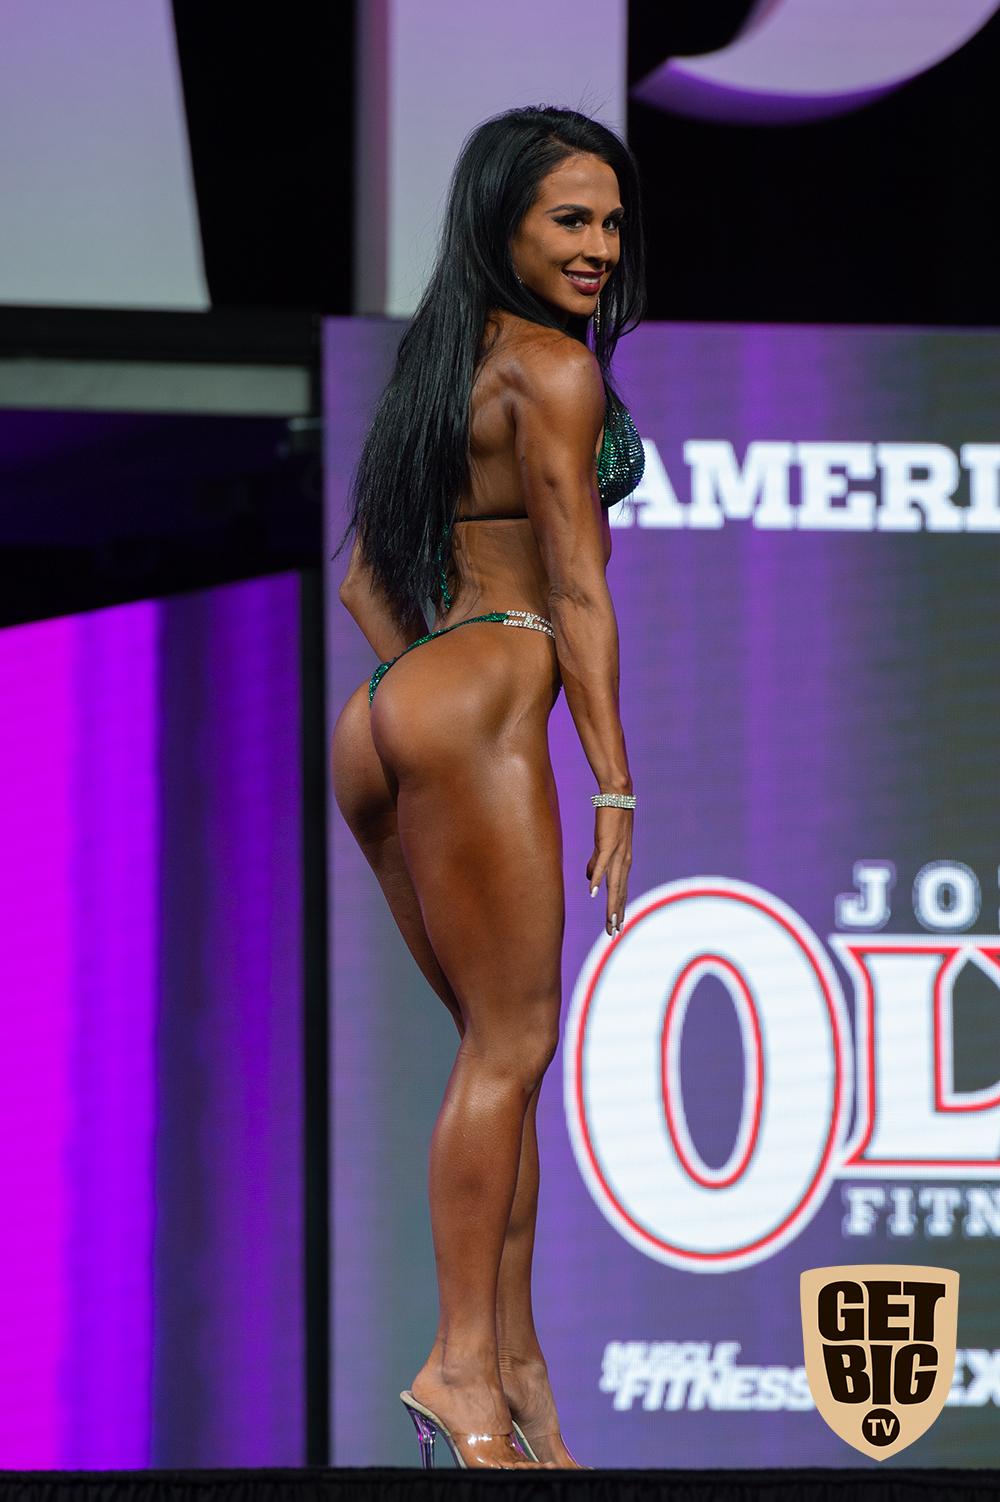 Ashley Kaltwasser / USA - 5 место «Bikini Olympia»-2018